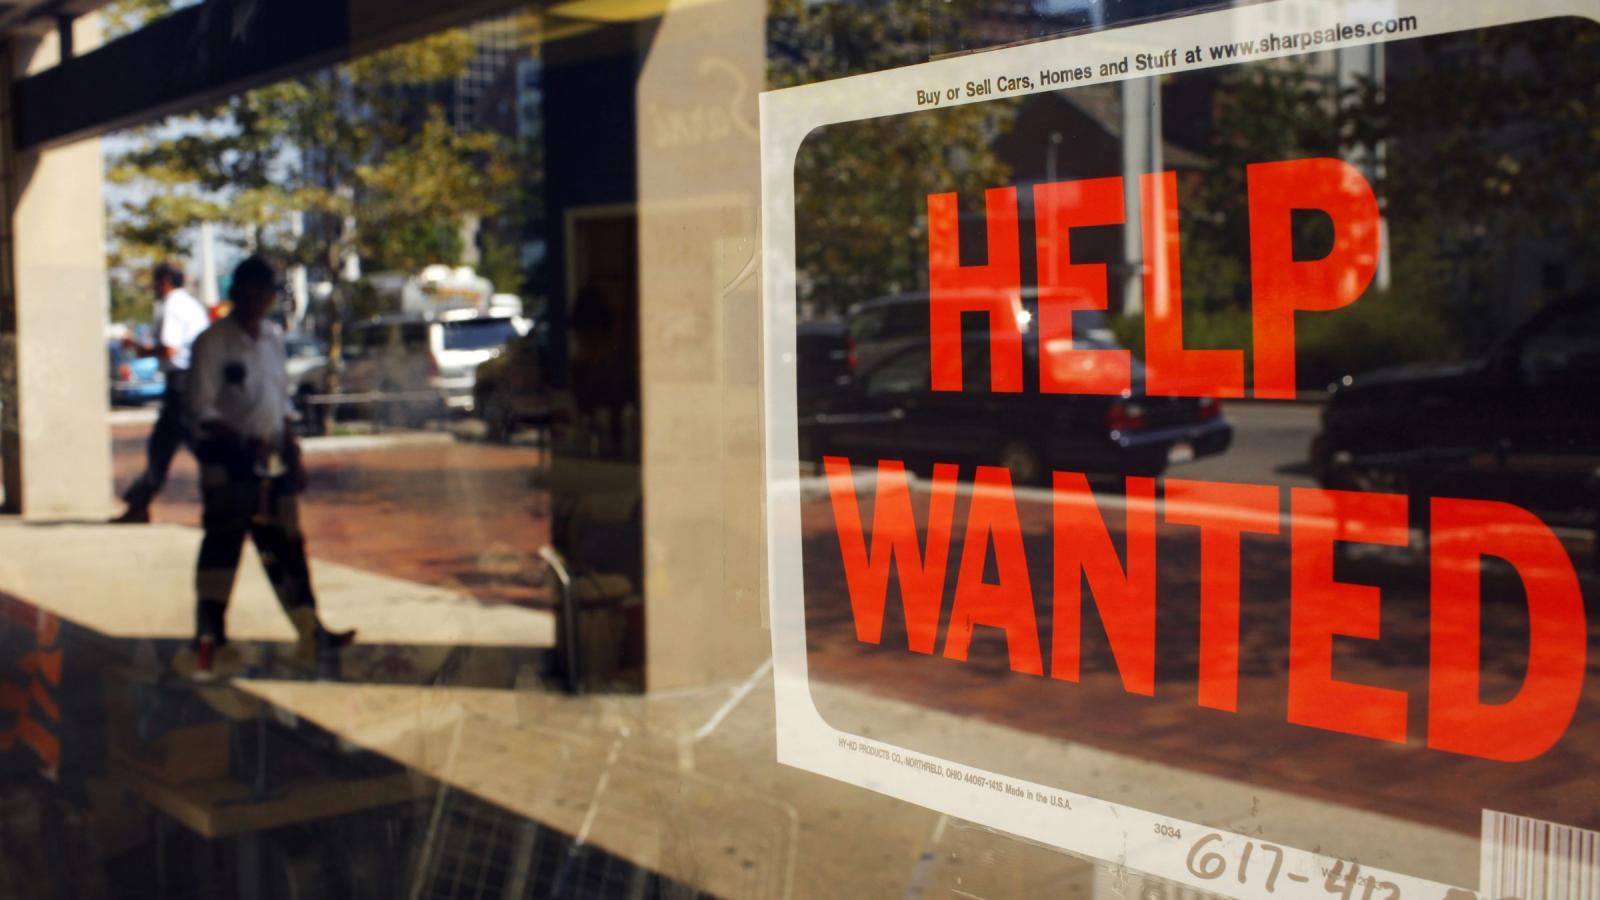 us jobs hiring help wanted Pedidos de auxílio desemprego aumentam 1.500% em NJ